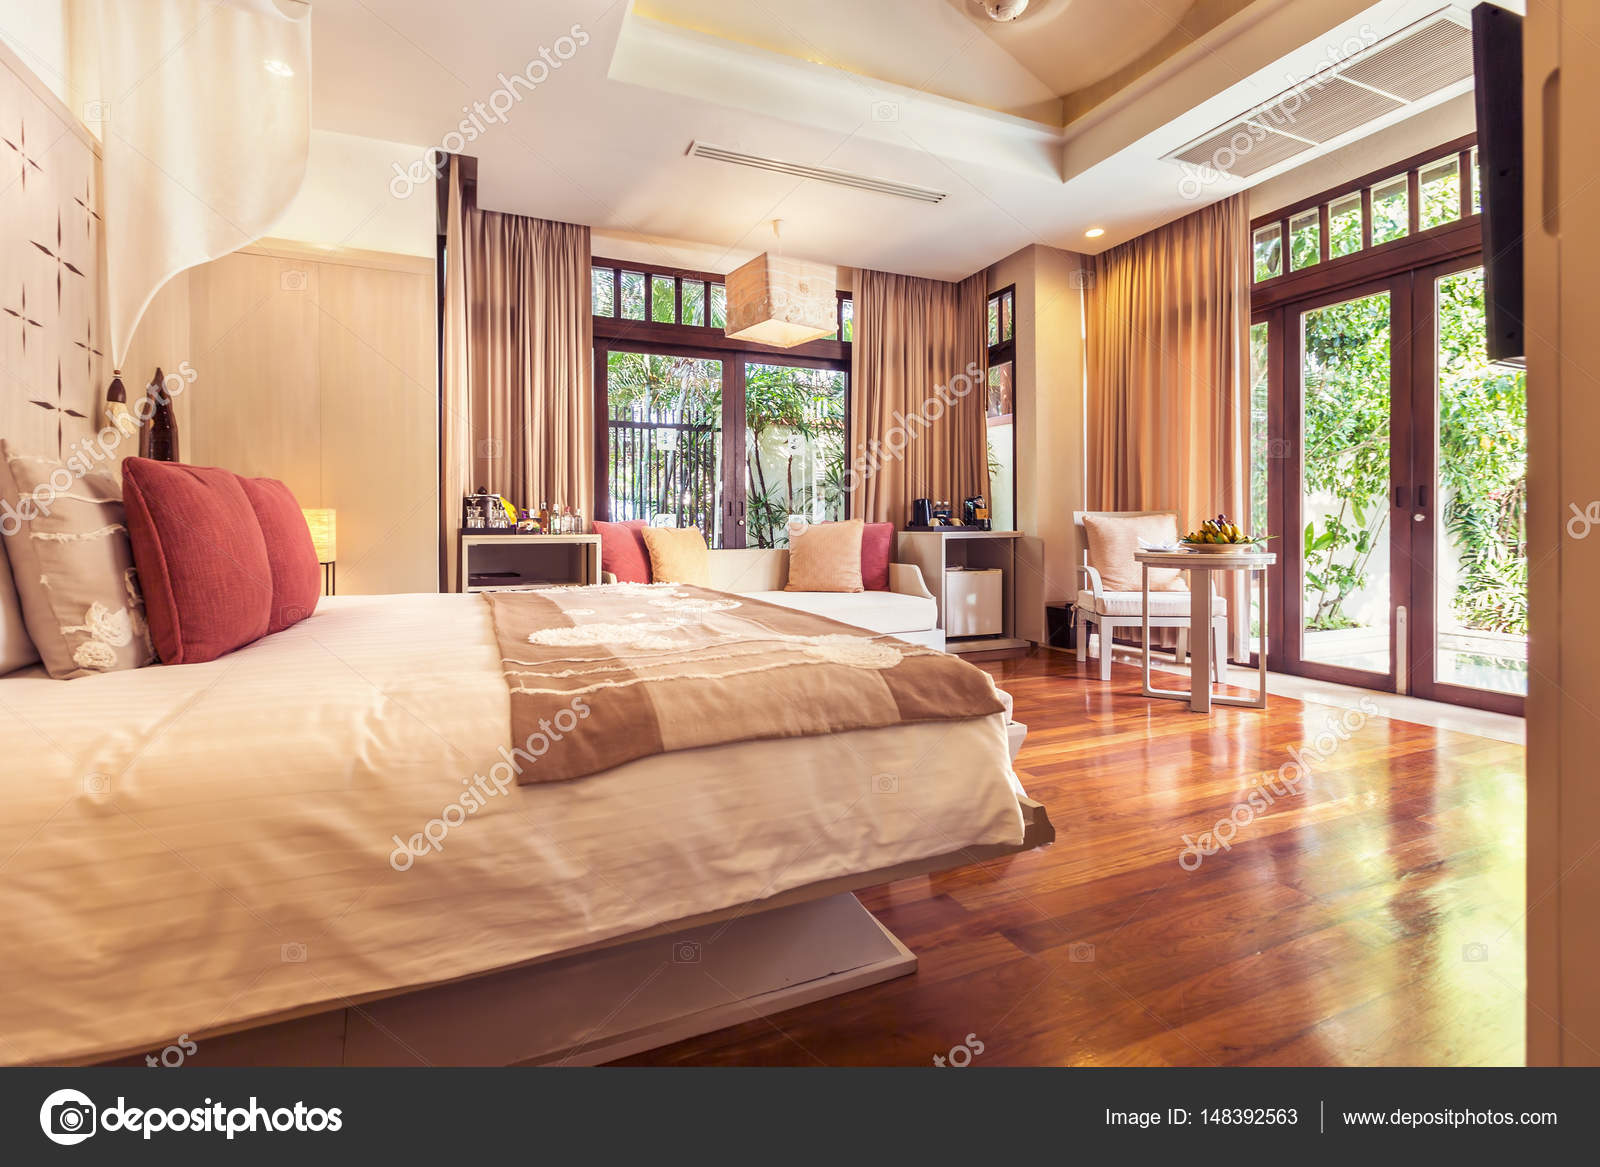 https://st3.depositphotos.com/3915017/14839/i/1600/depositphotos_148392563-stockafbeelding-luxe-slaapkamer-hotel-interieur.jpg